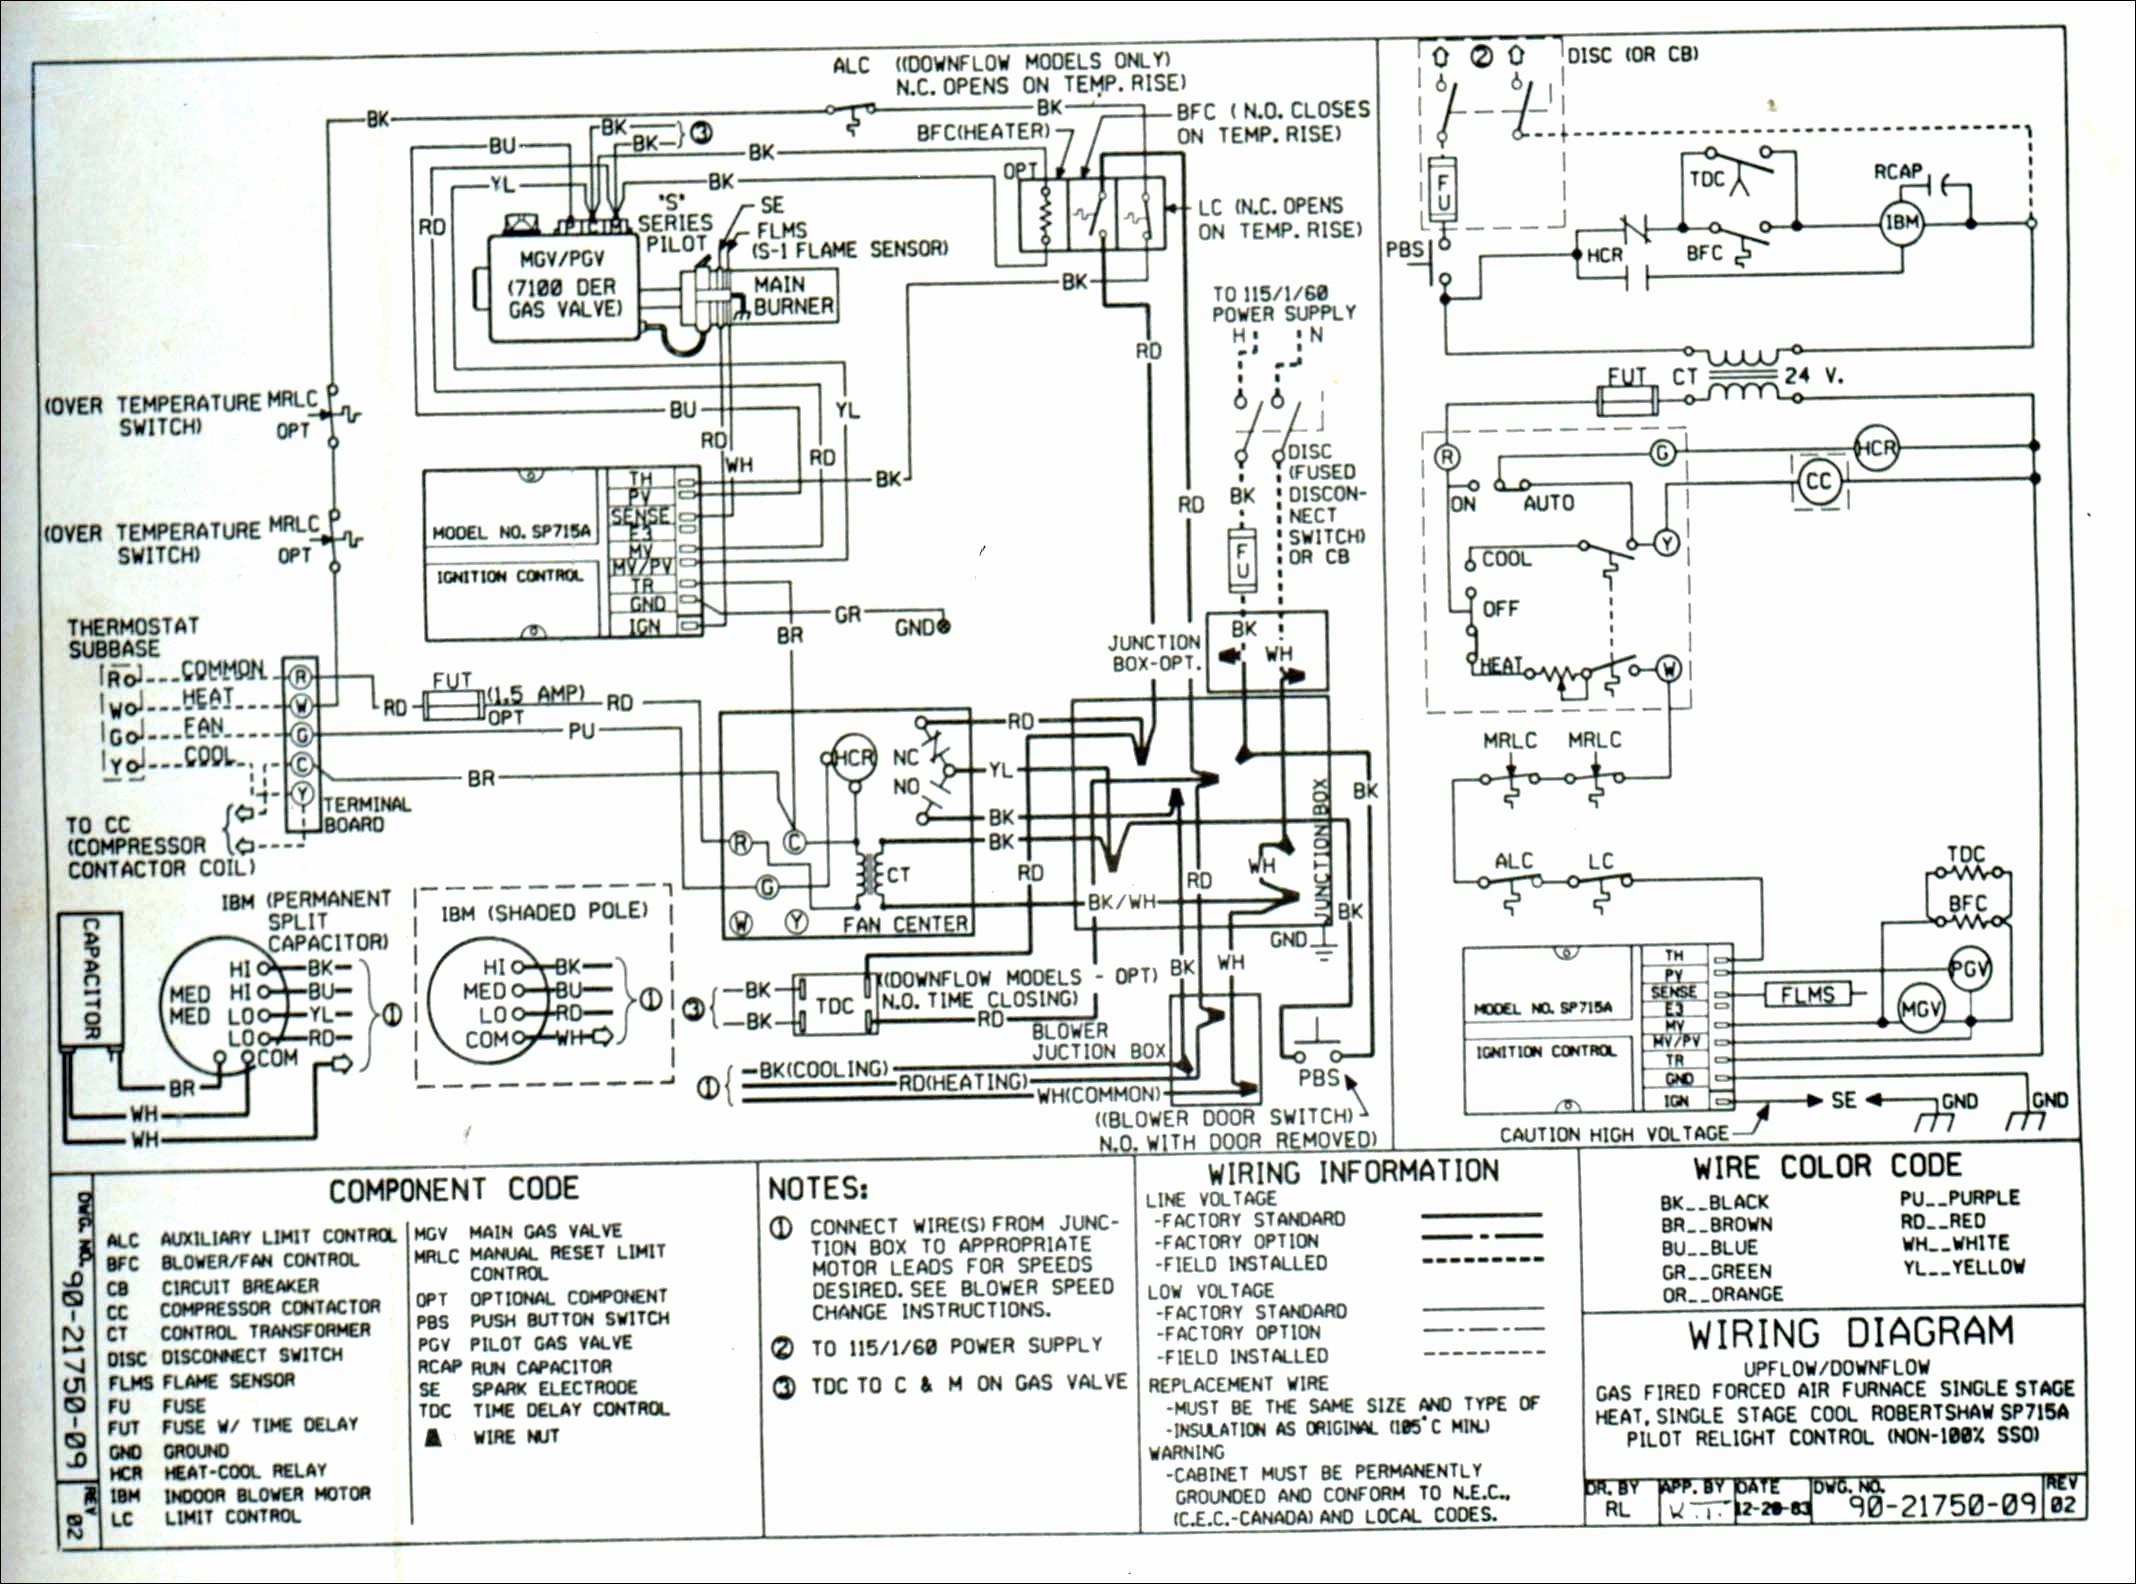 70 1761 Wiring Diagram | Best Wiring Library - Electric Heat Strip Wiring Diagram